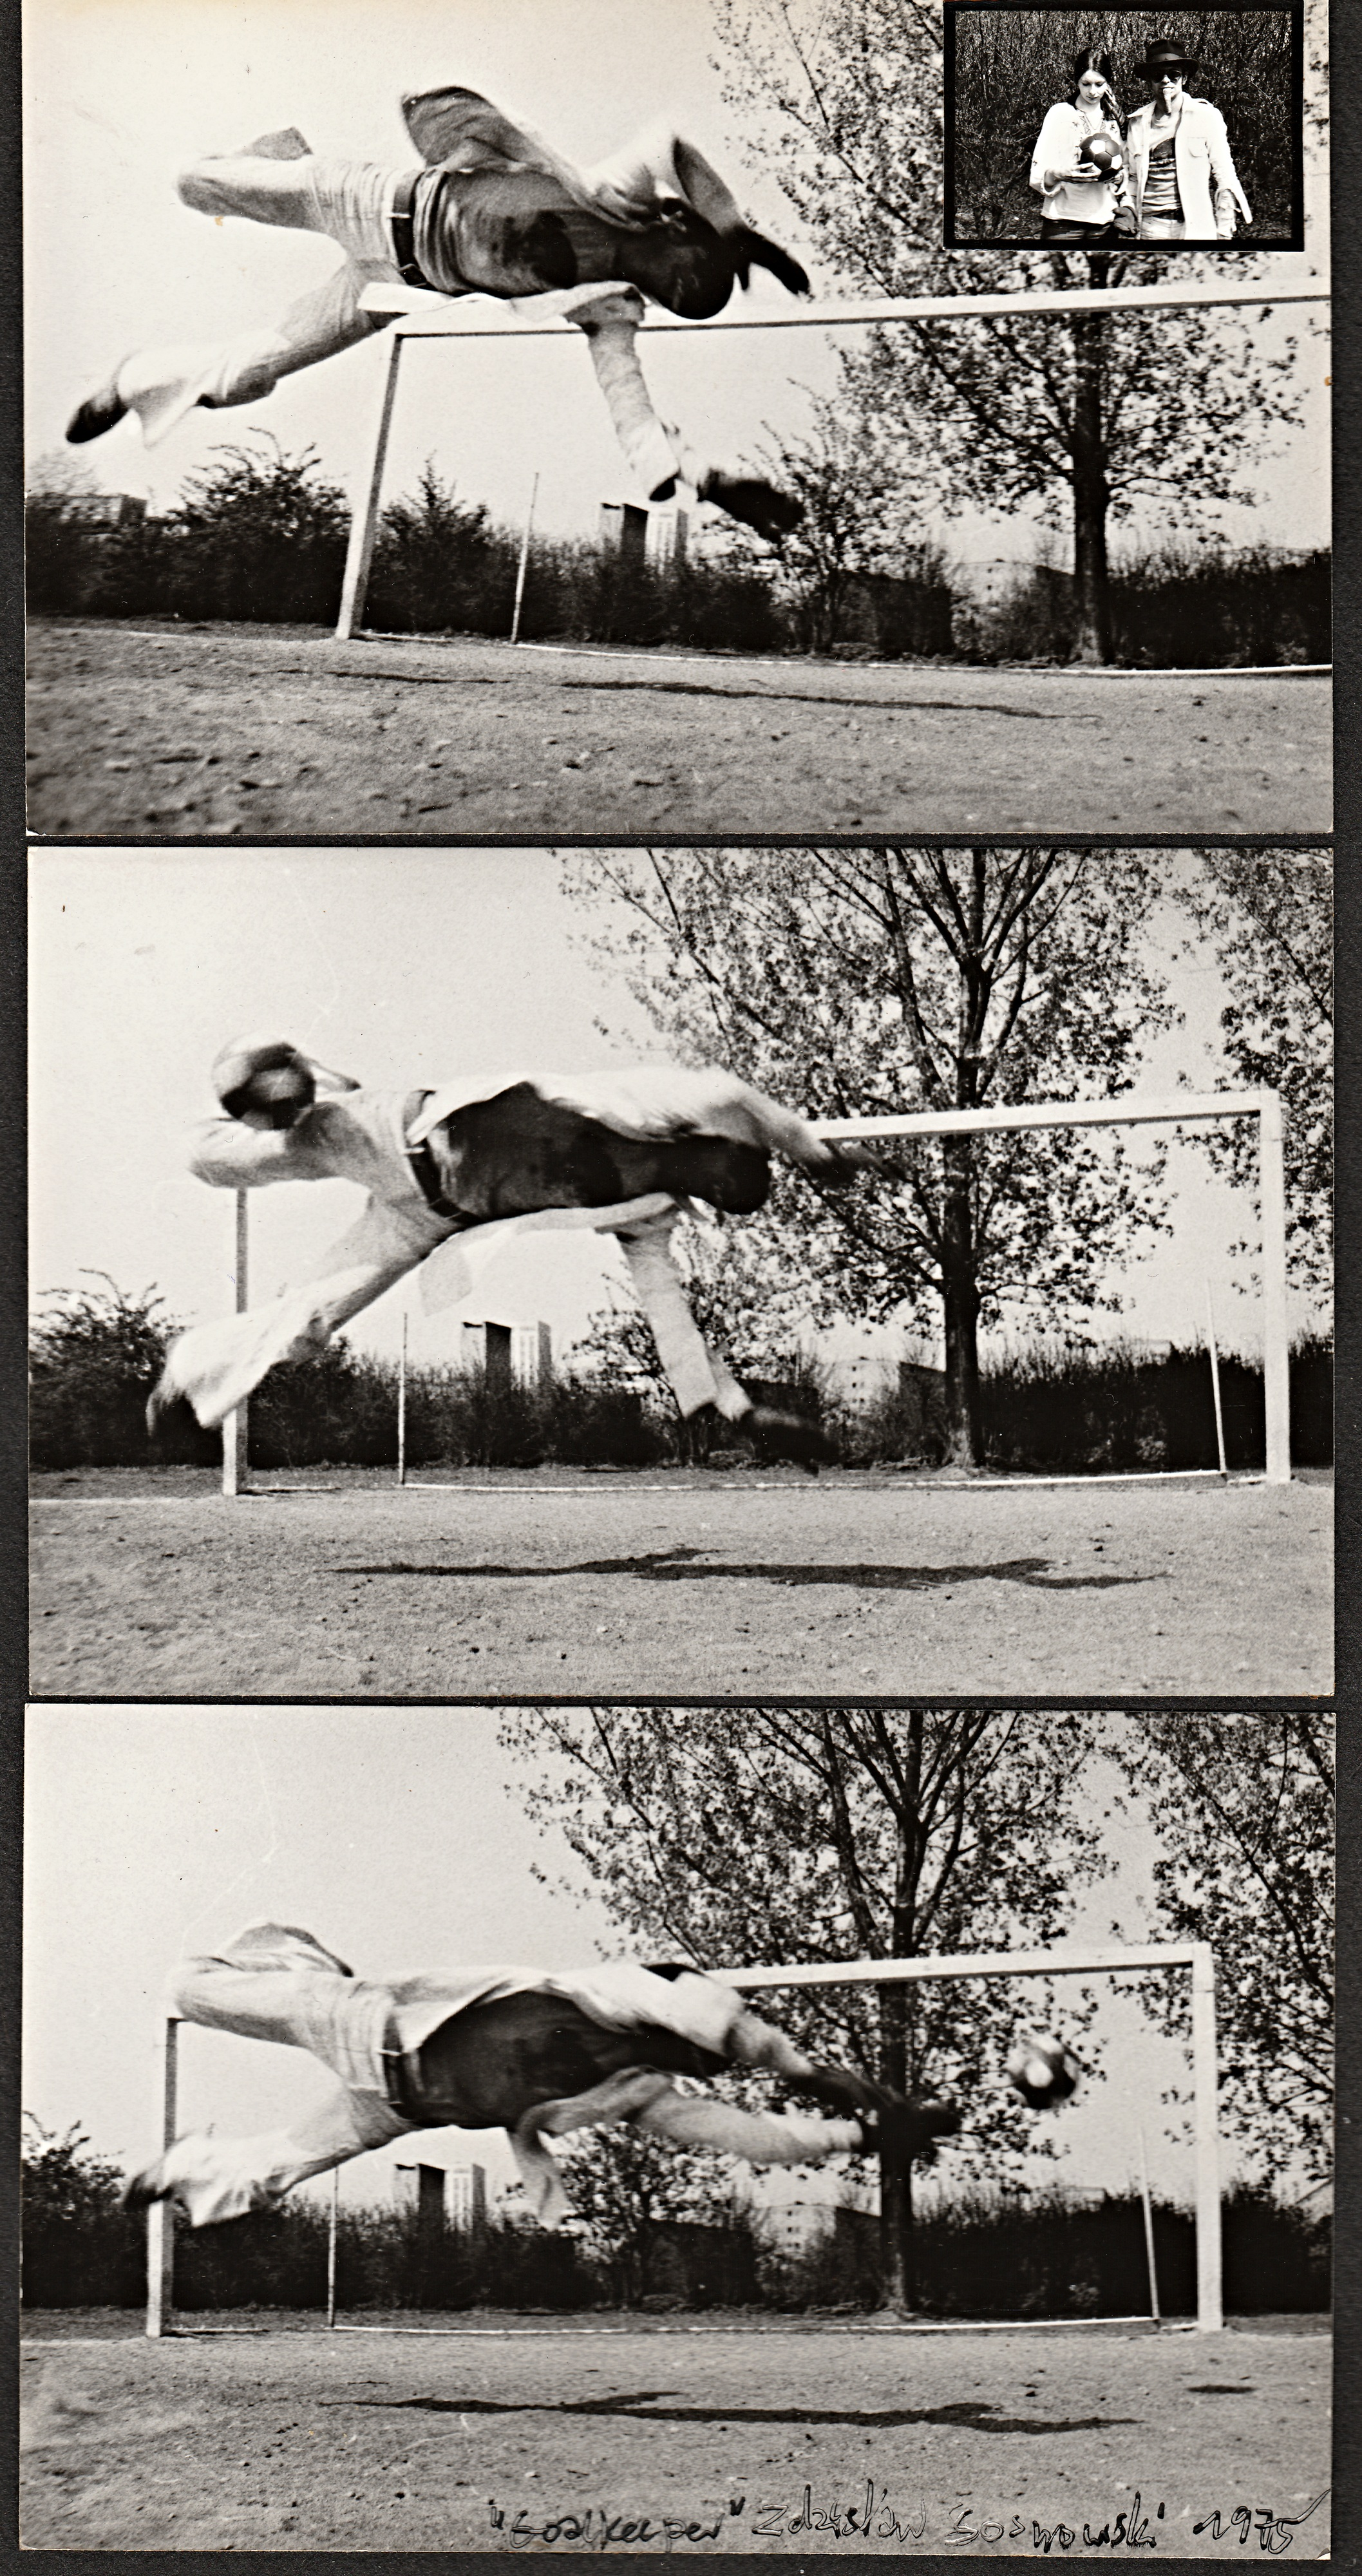 Goalkeeper, 1975